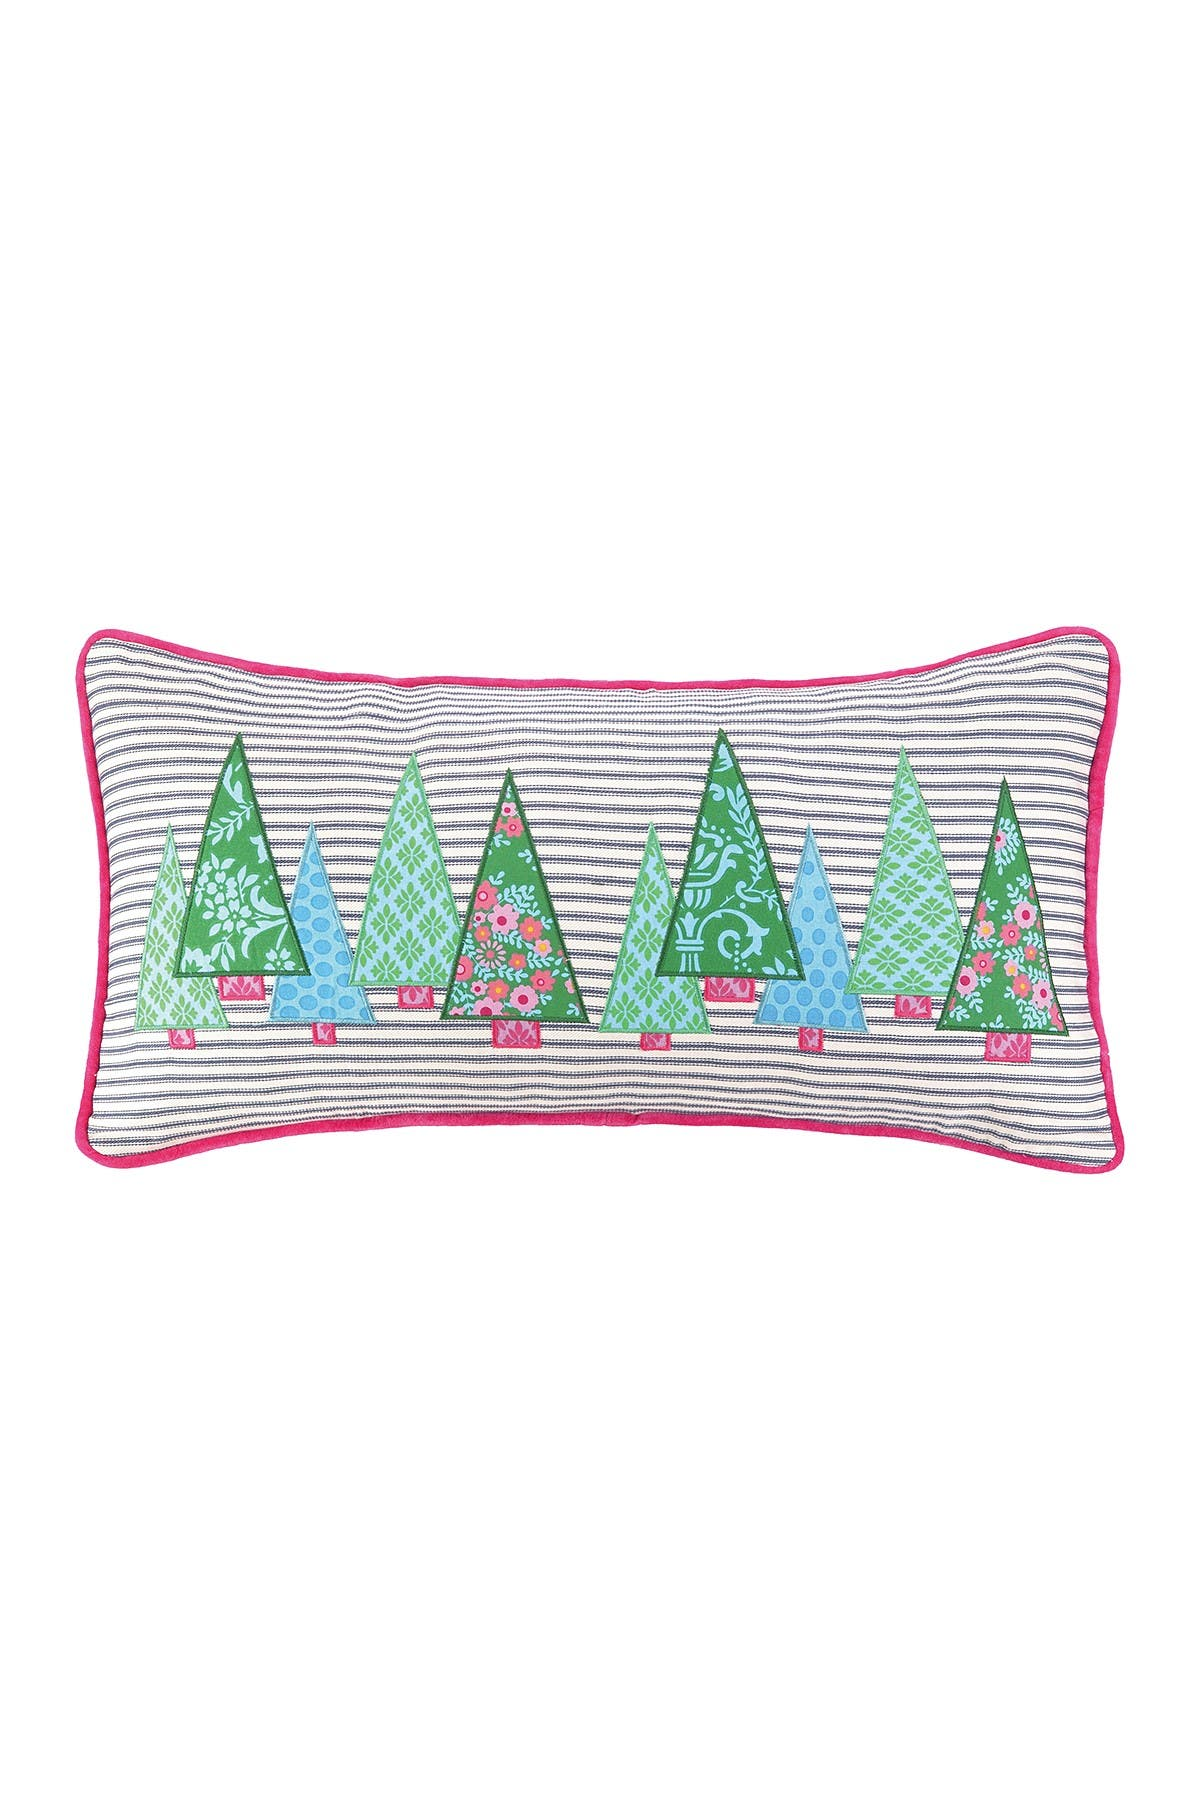 Image of Peking Handicraft Holiday Ticking Forest 14x26 Pillow